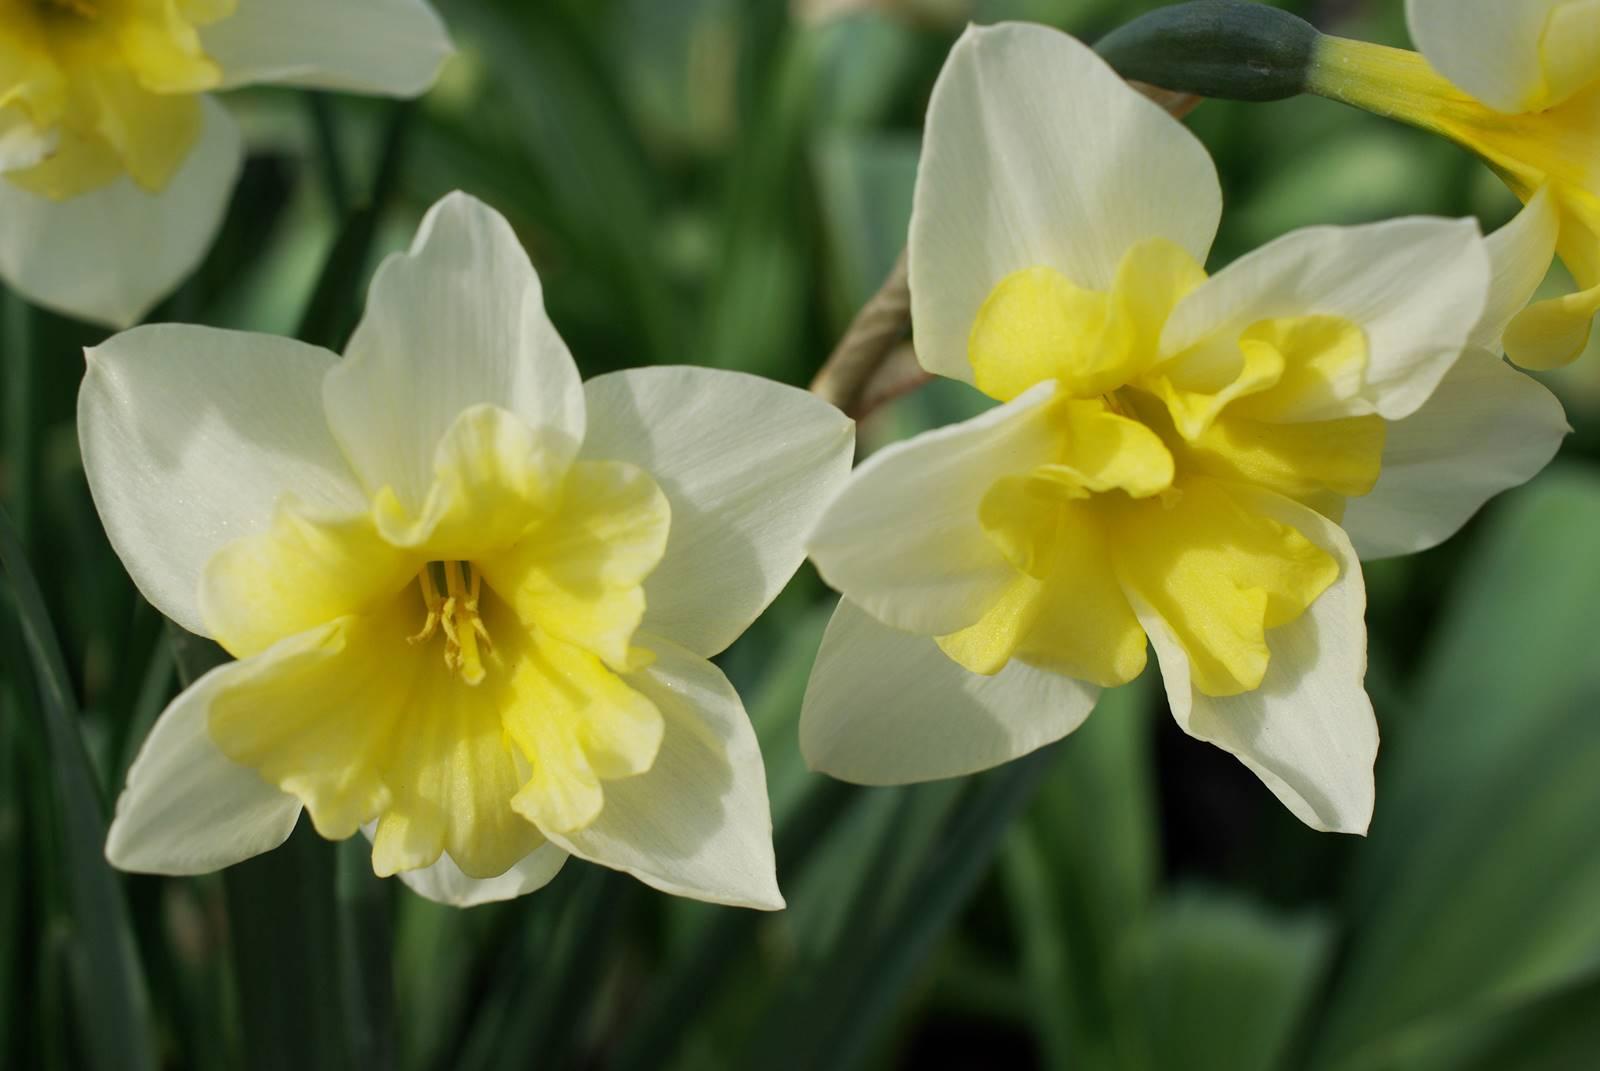 Narcisse et jonquille